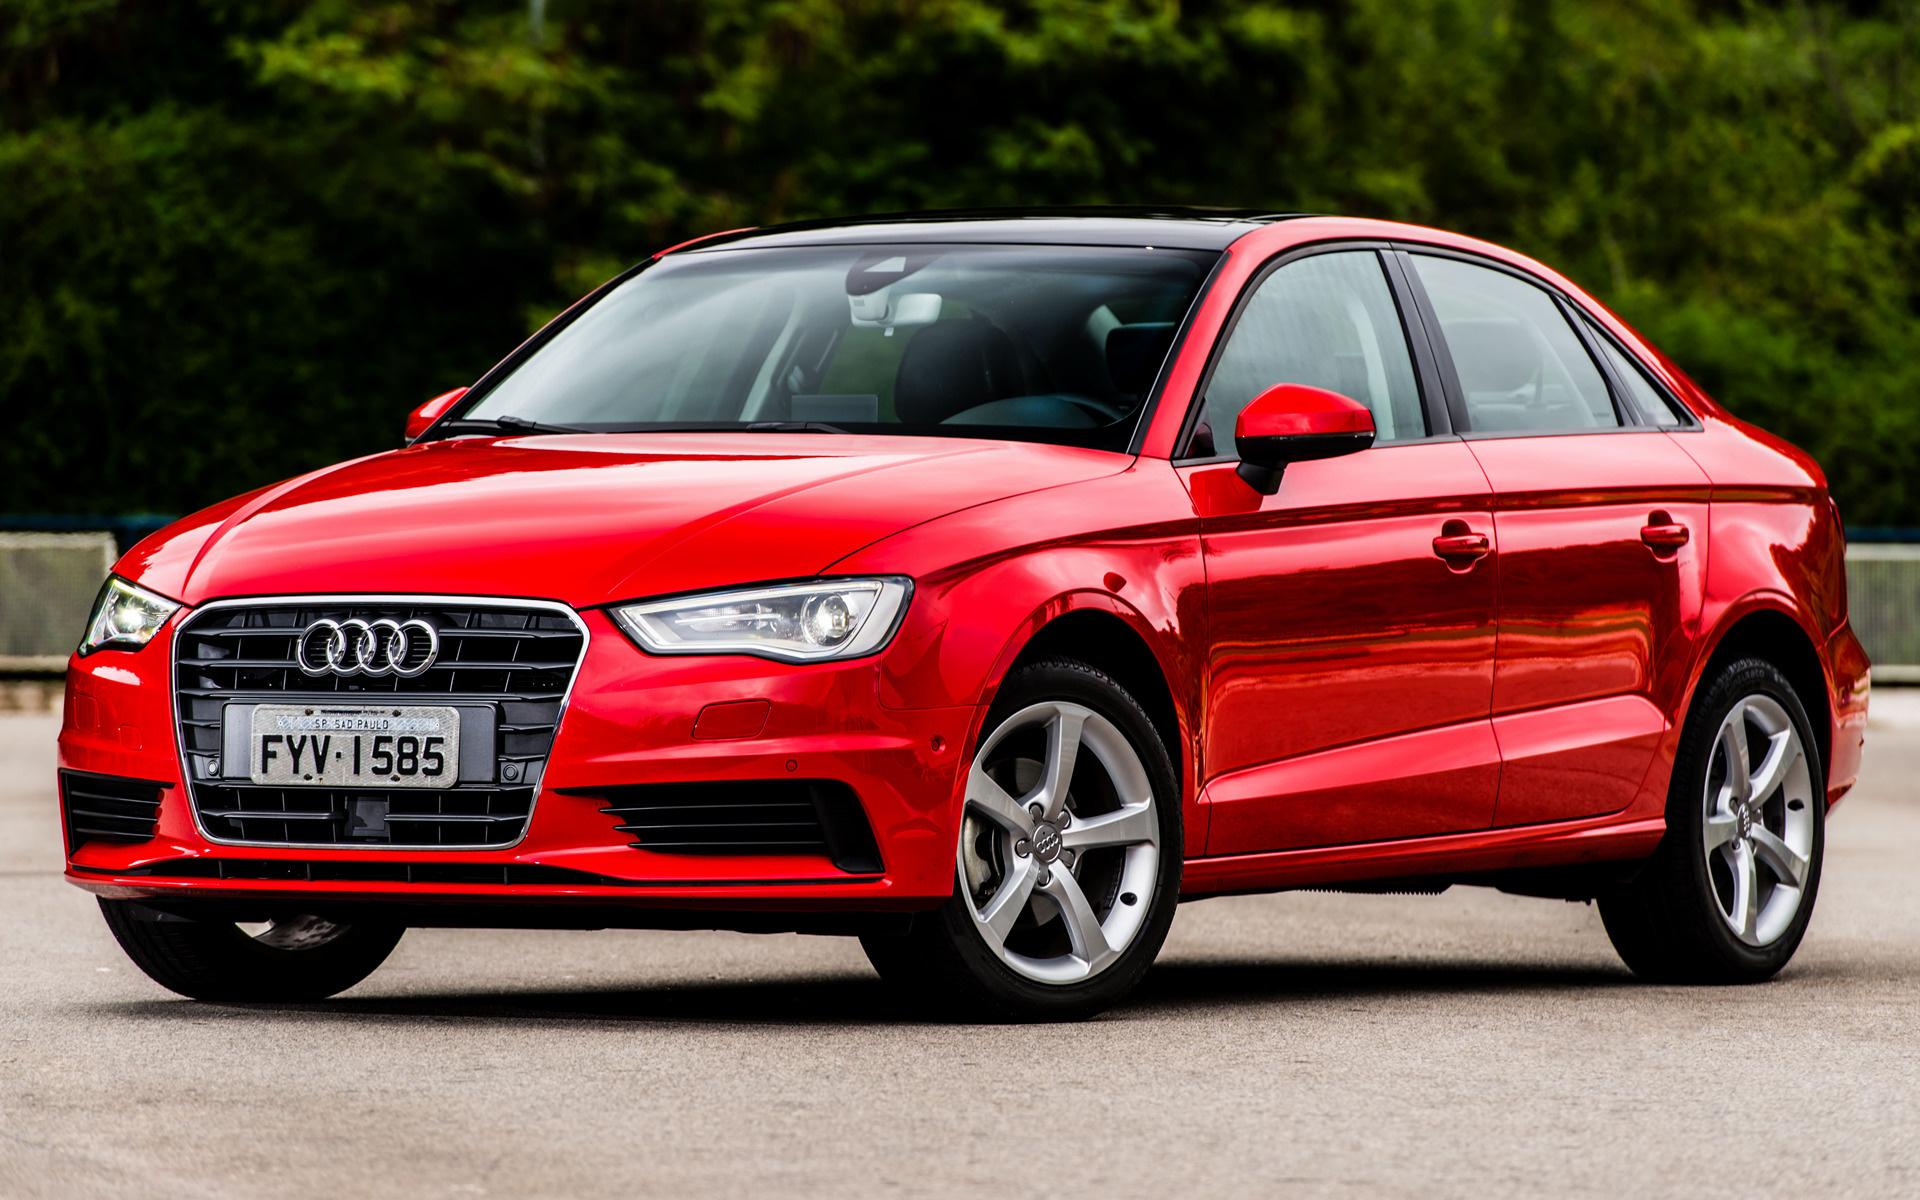 Audi A3 Sedan >> 2014 Audi A3 Sedan (BR) - Wallpapers and HD Images | Car Pixel